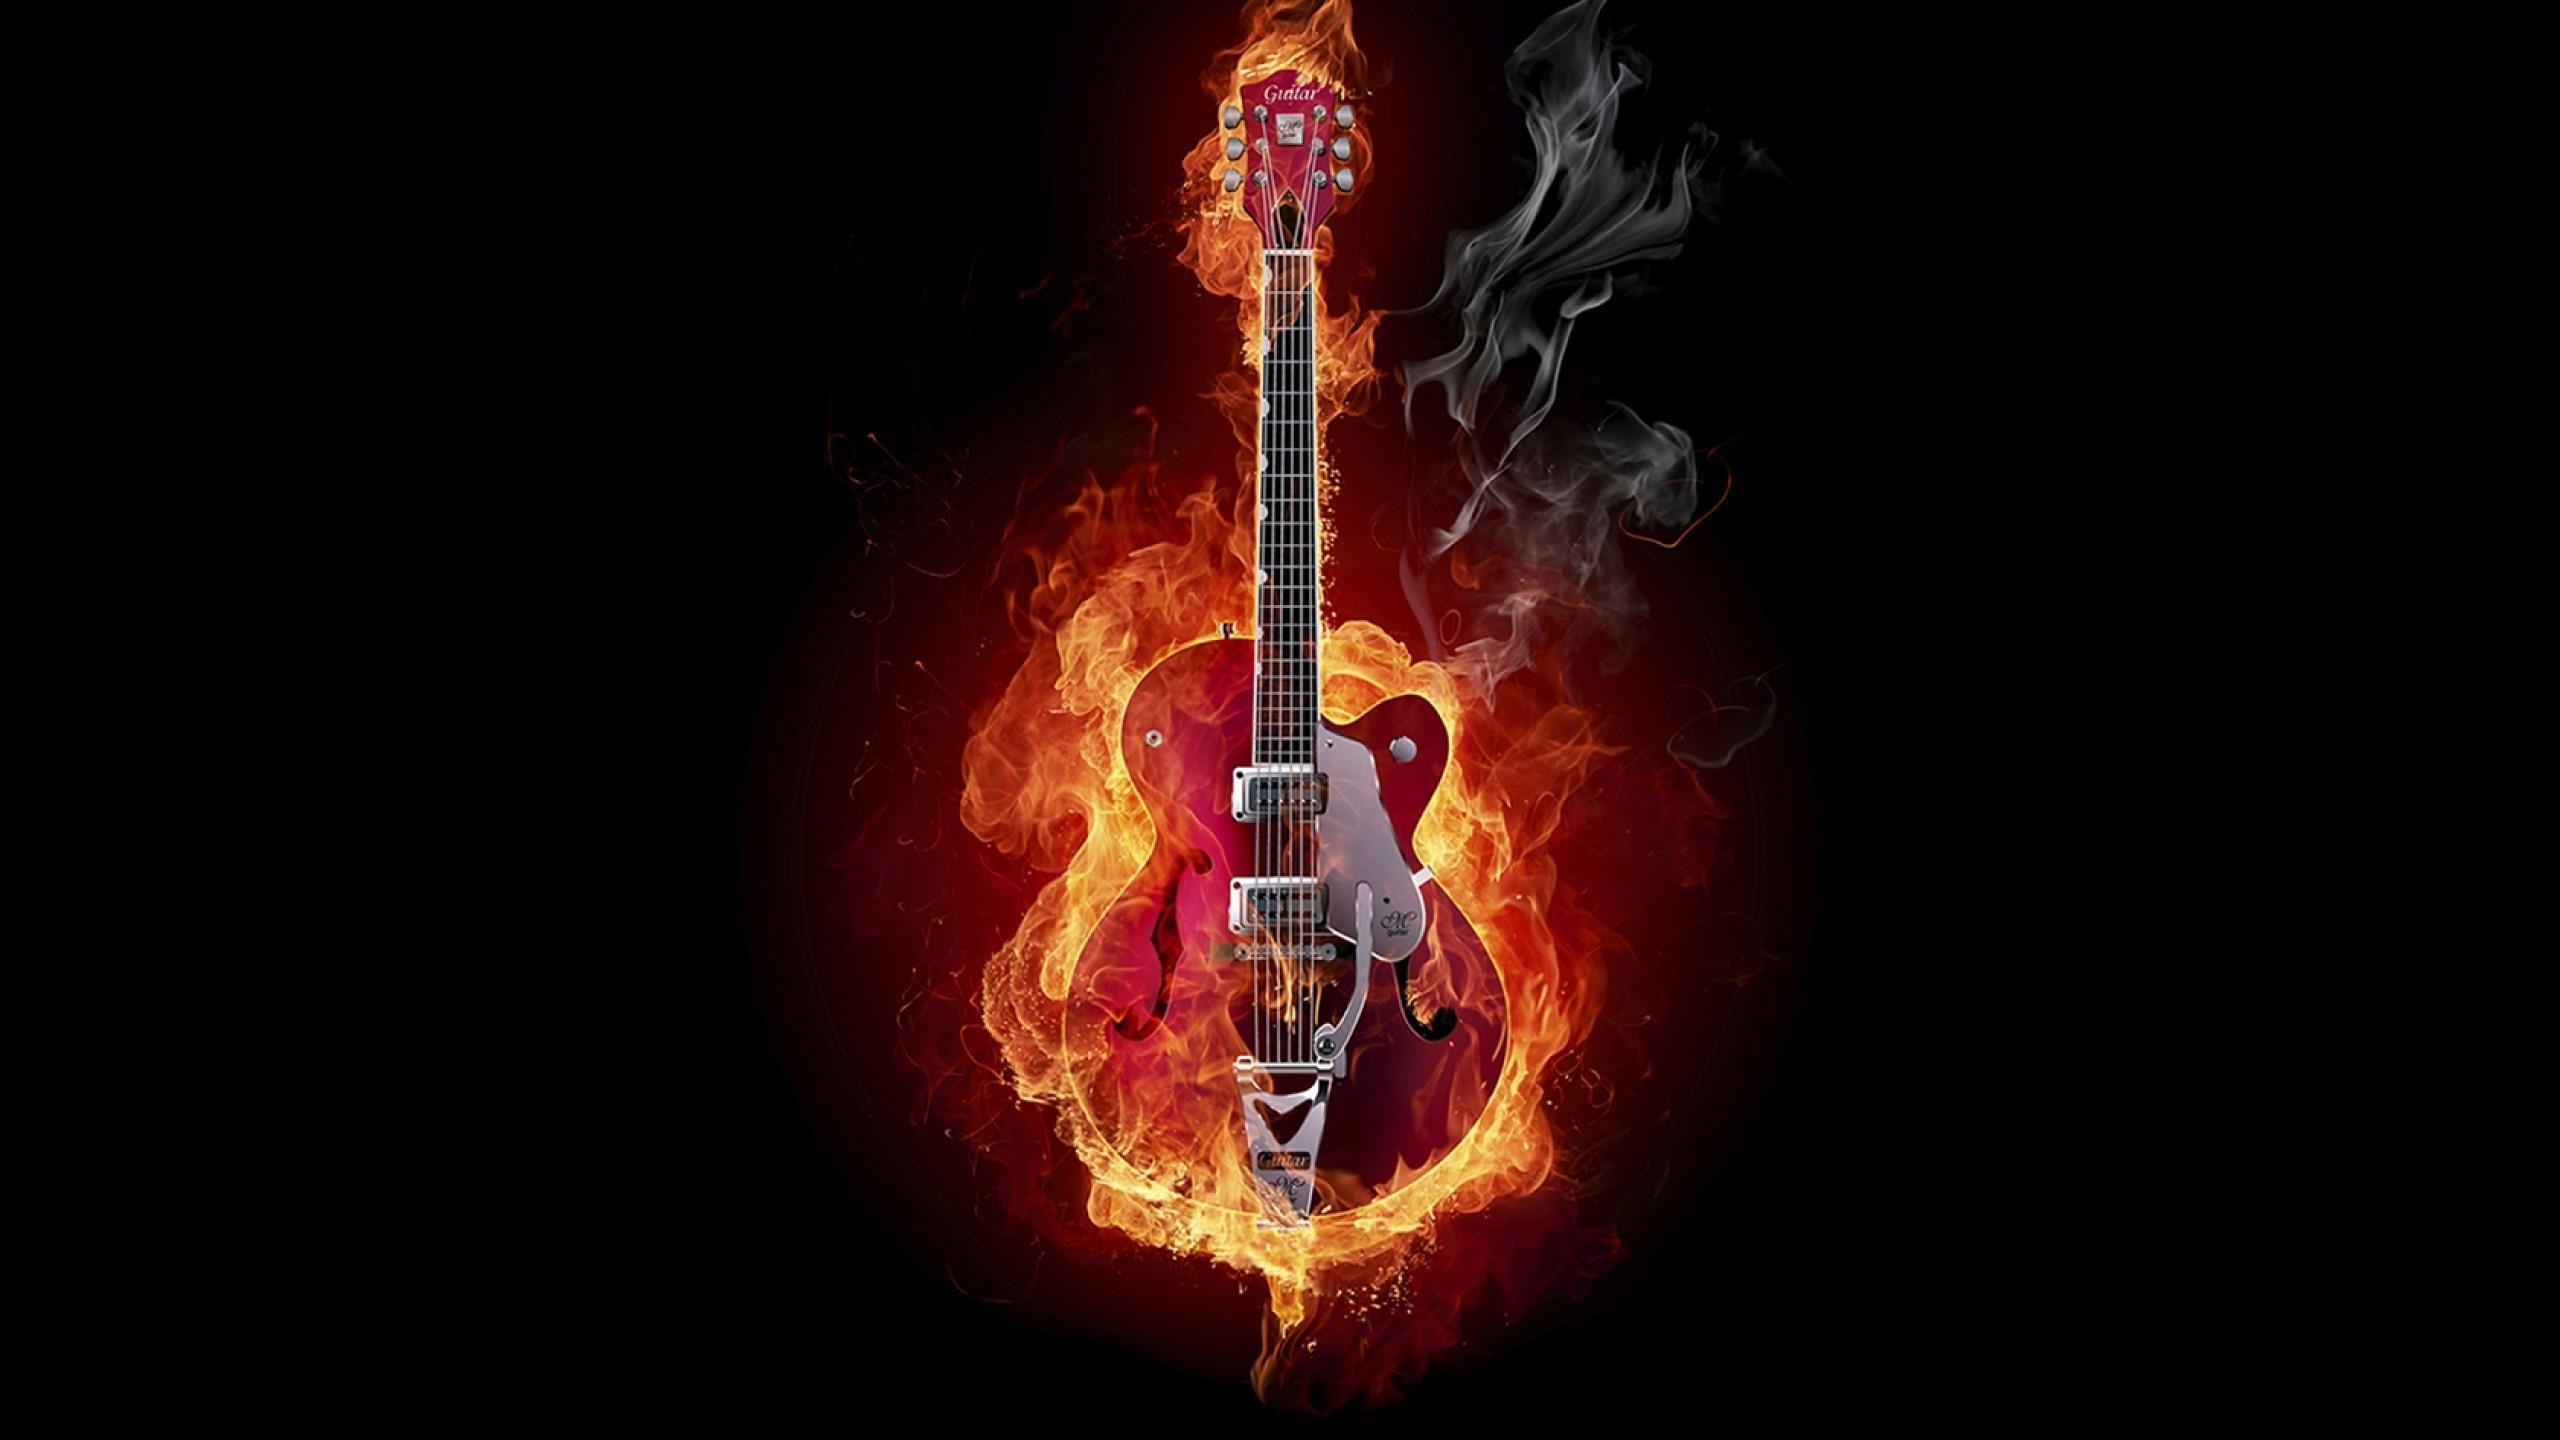 Preview wallpaper guitar, fire, instrument, smoke, background 2560×1440